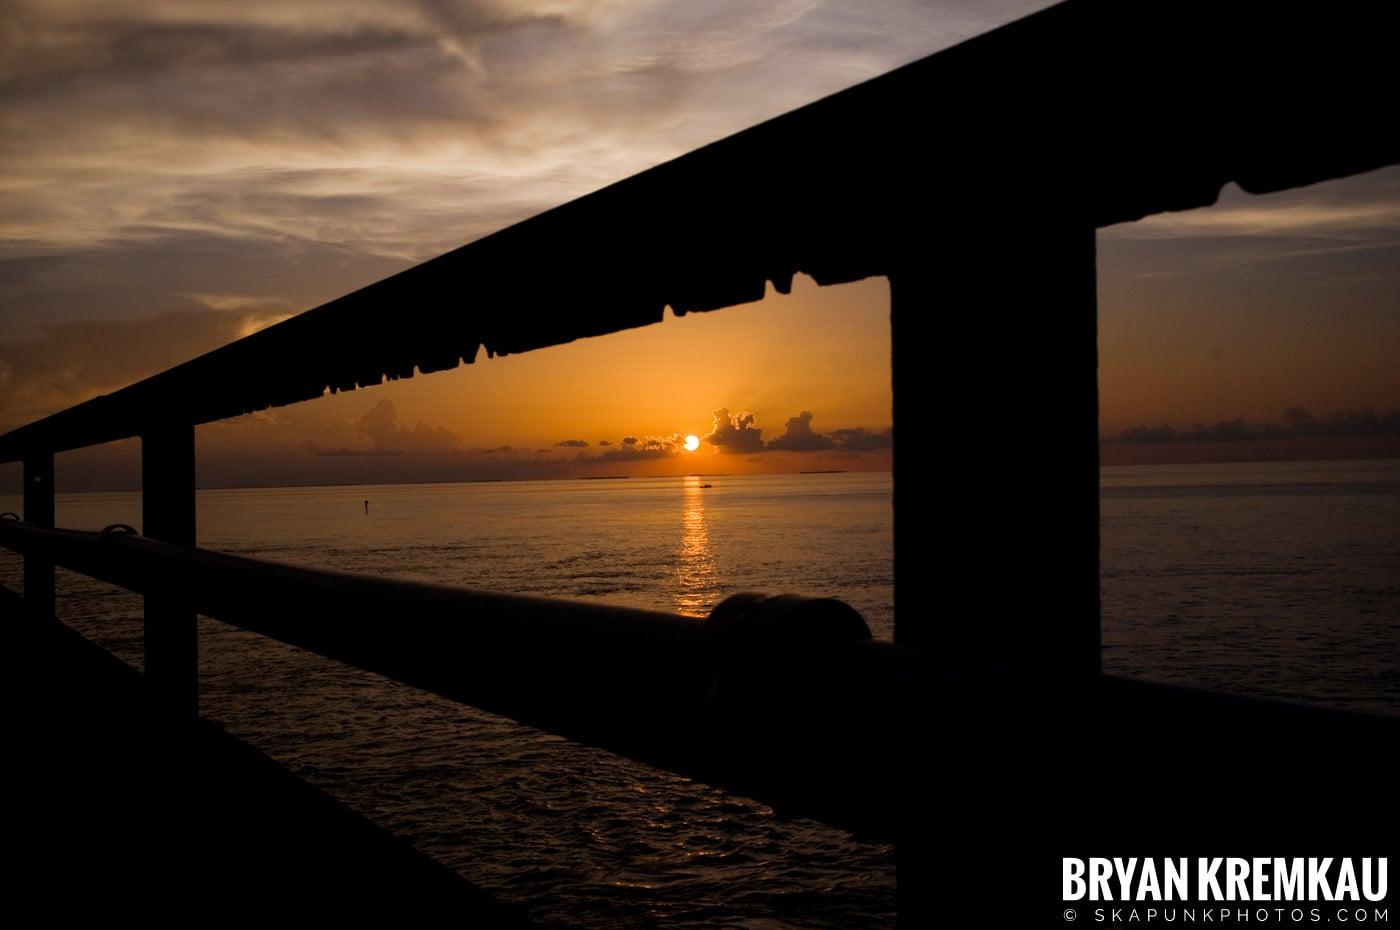 Florida Keys Vacation - 7.09.10 - 7.15.10 (80)